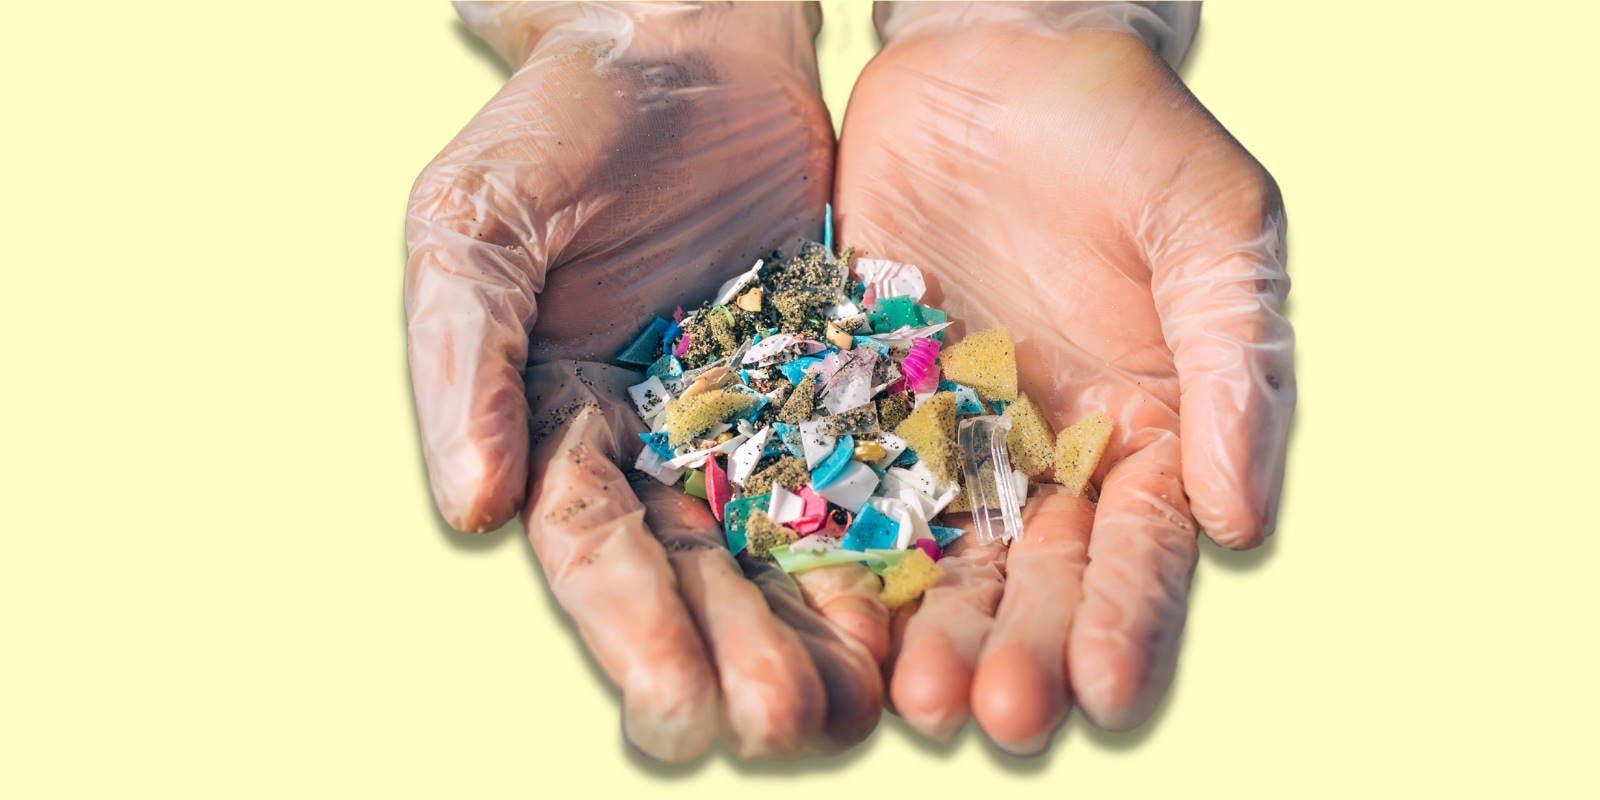 Microplastics In Cosmetics